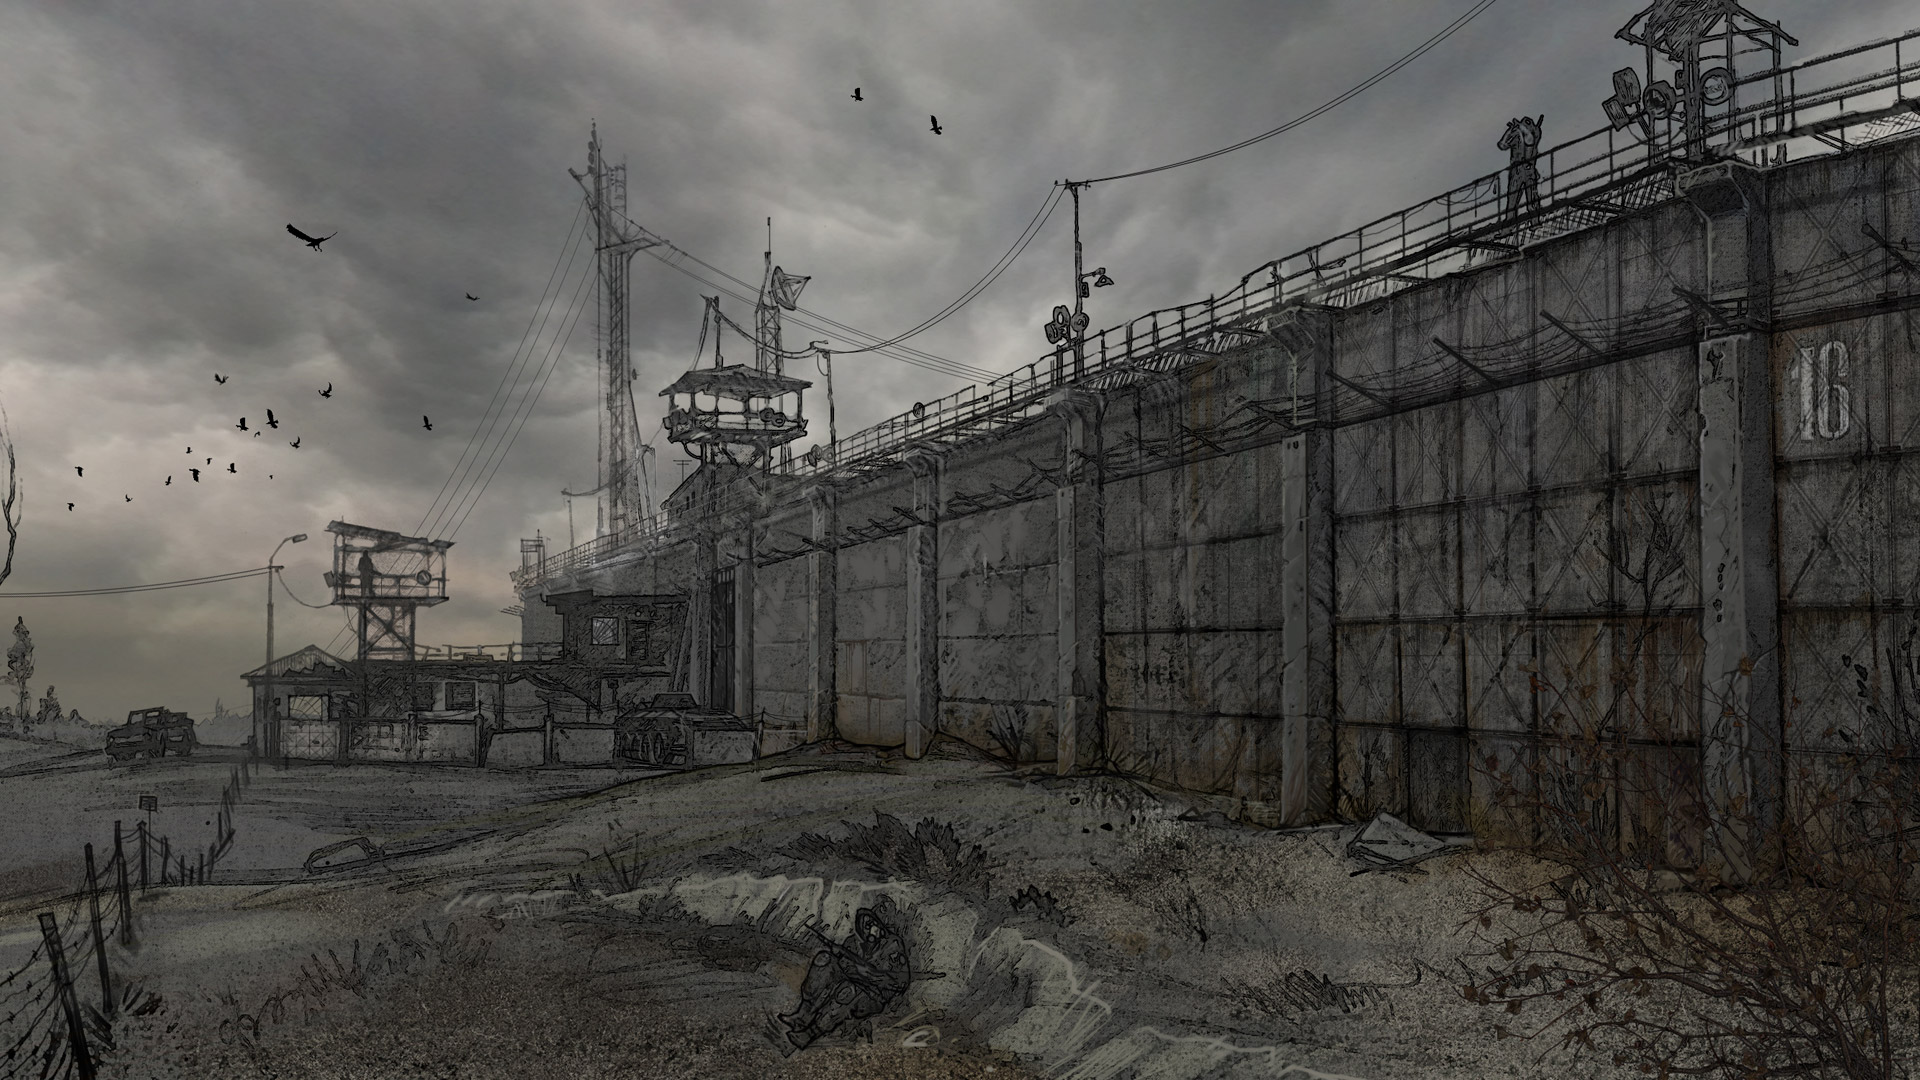 Free S.T.A.L.K.E.R.: Call of Pripyat Wallpaper in 1920x1080